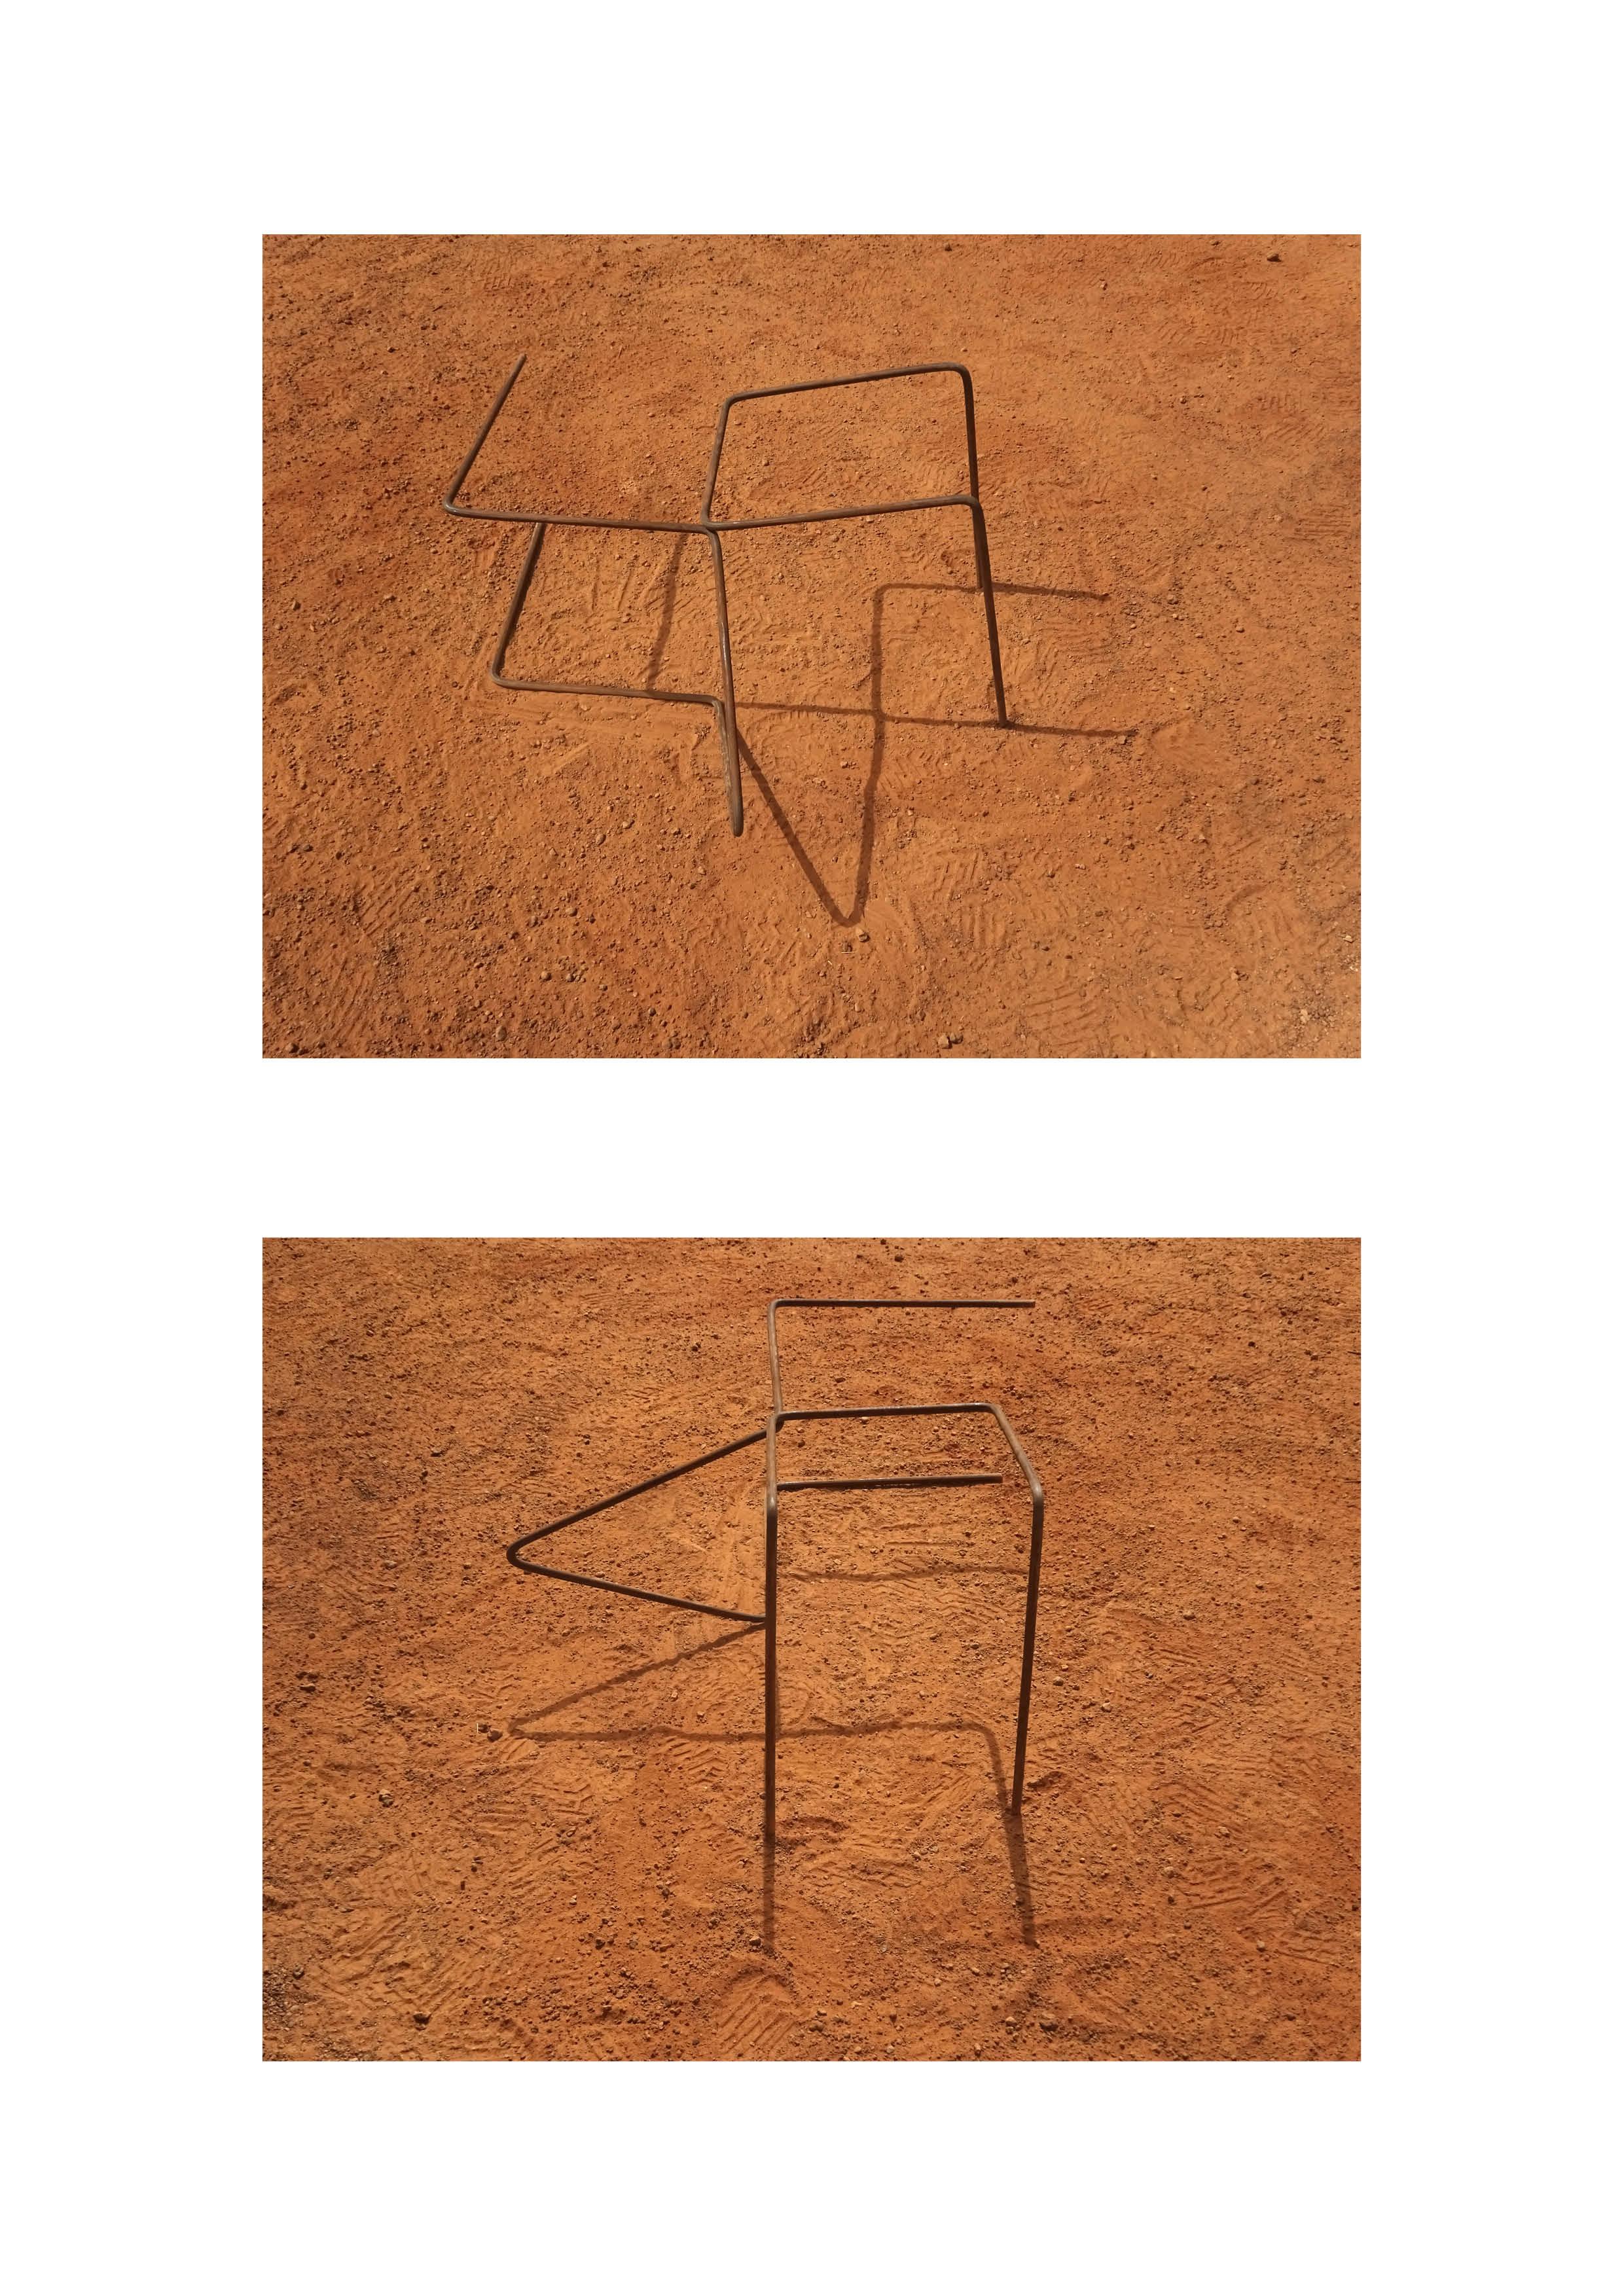 Reiventing a chair (2016) - Diego Sologuren